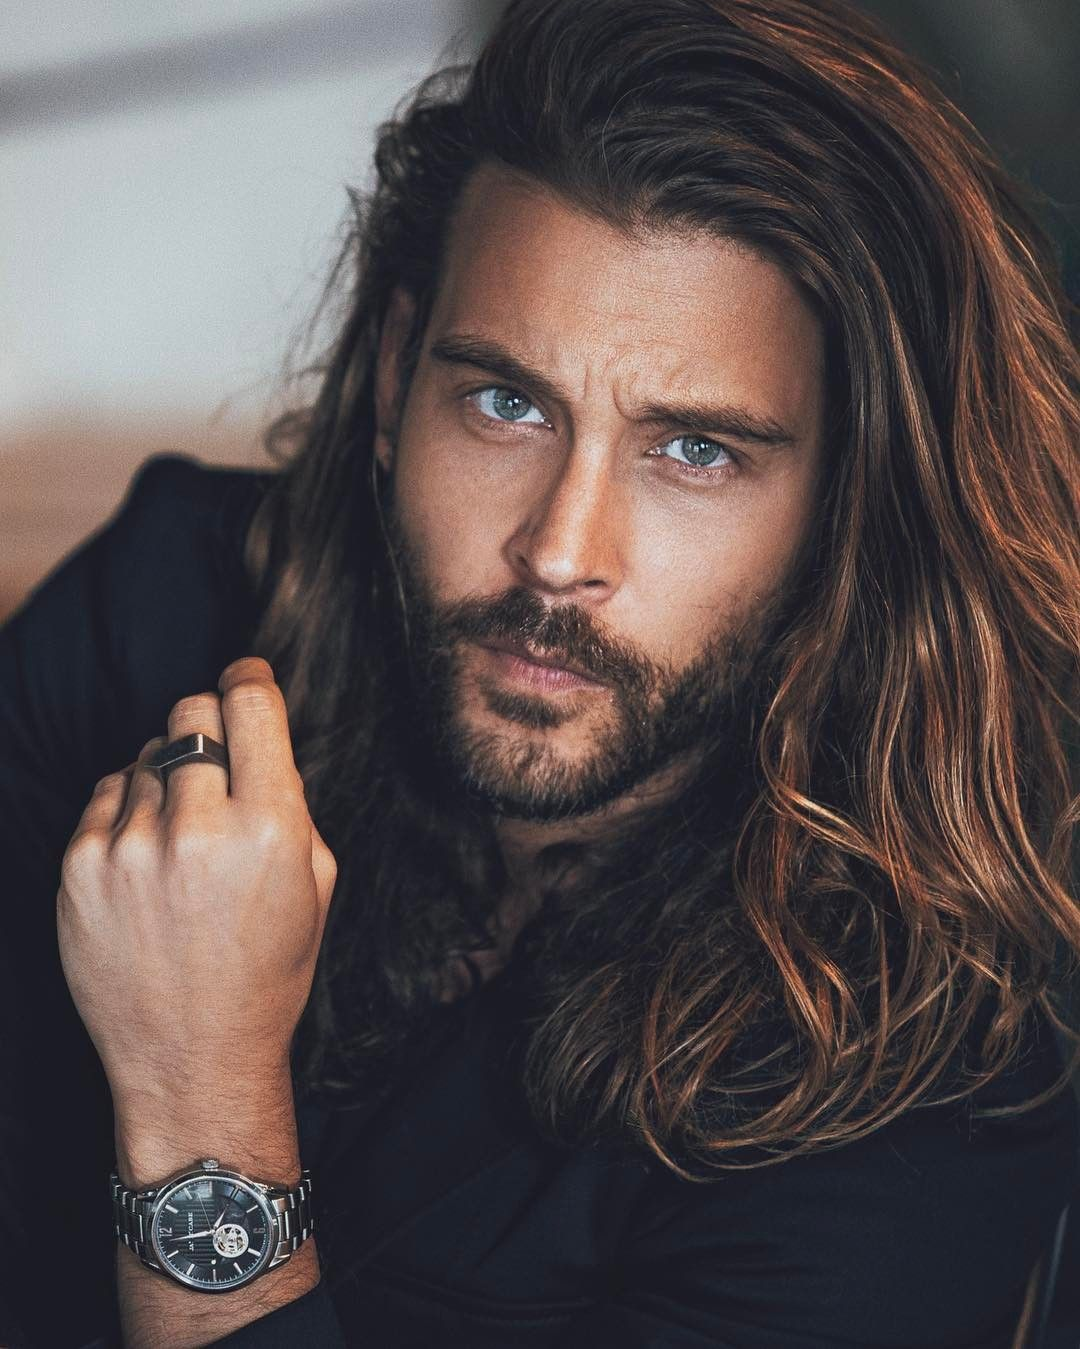 Haircuts men long pin by ariel banks on hair  pinterest  long hair styles hair and